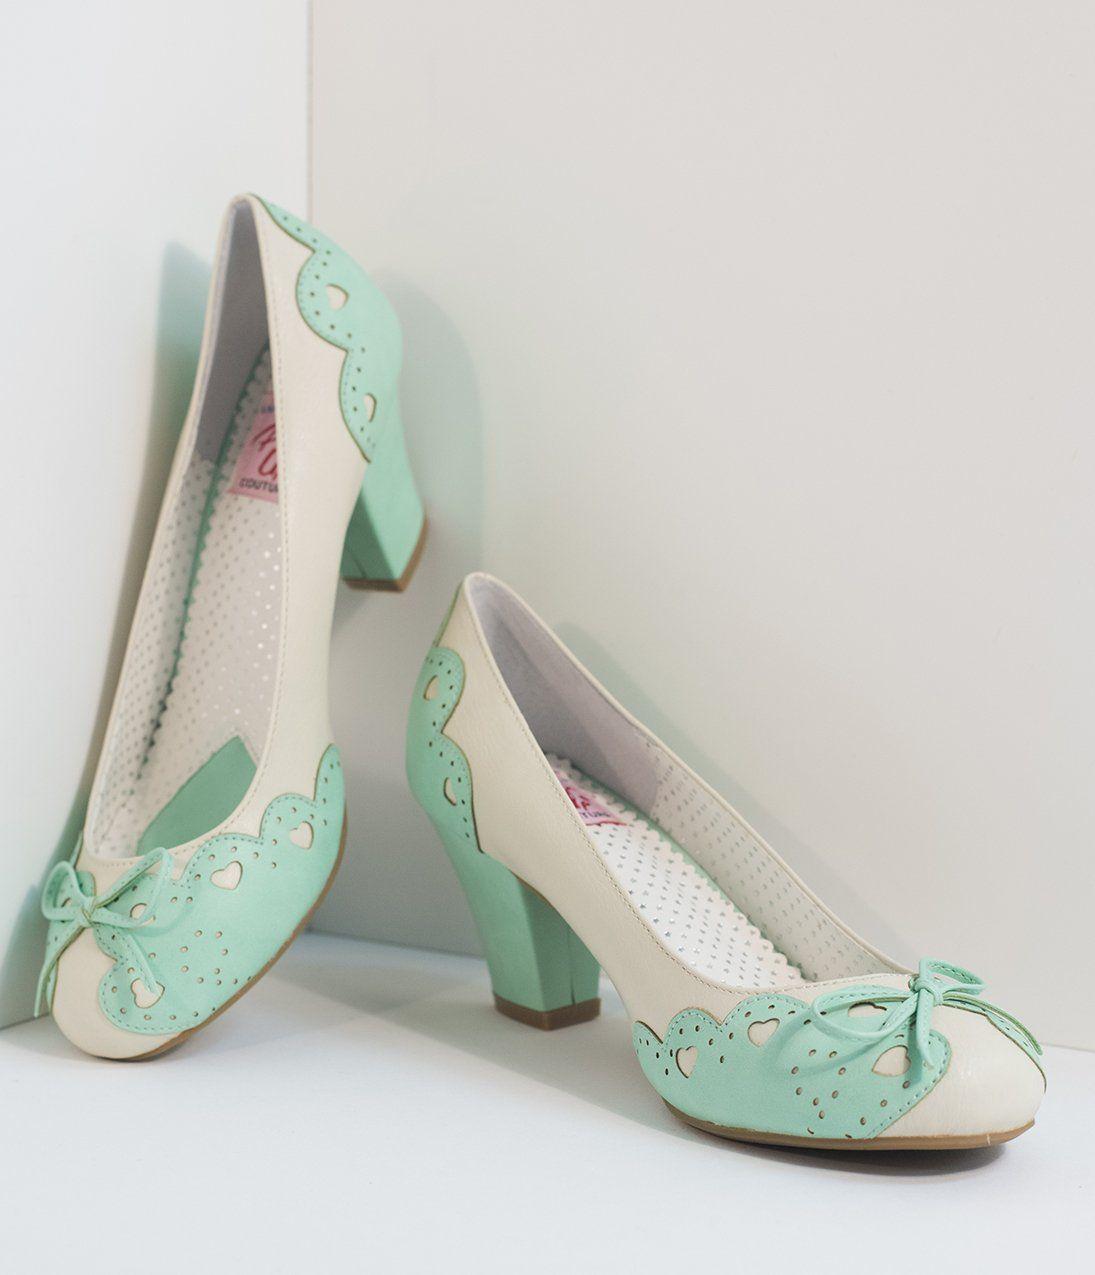 Vintage Shoes, Vintage Style Shoes